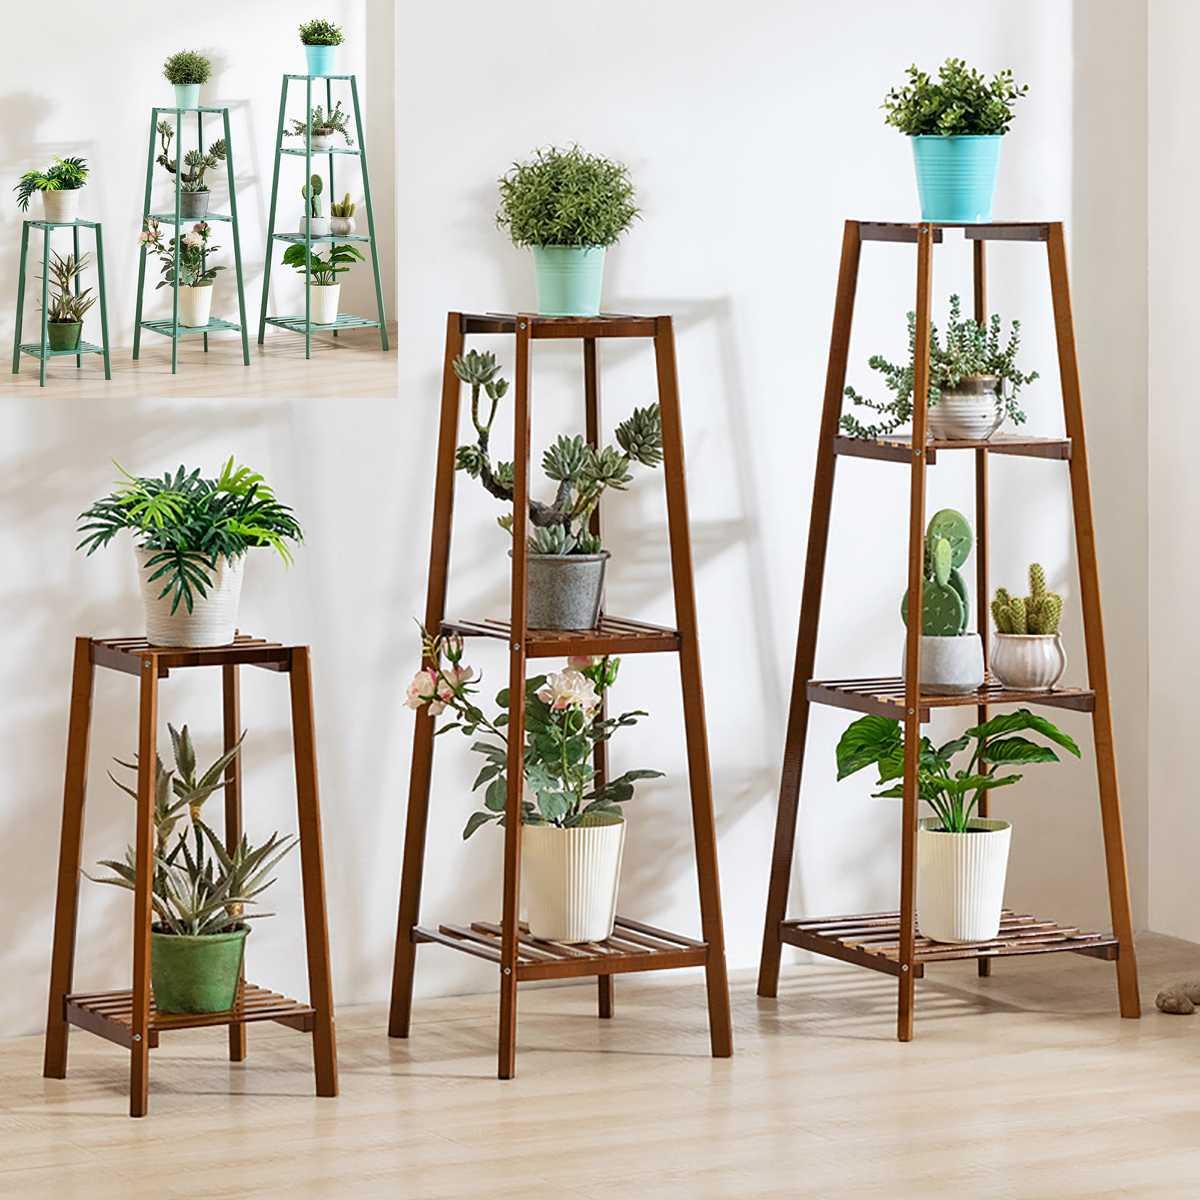 Wood-Stand Multi-Storey-Shelf Plants Landing-Type Indoor 4 for Light-Extravagant Flowerpot